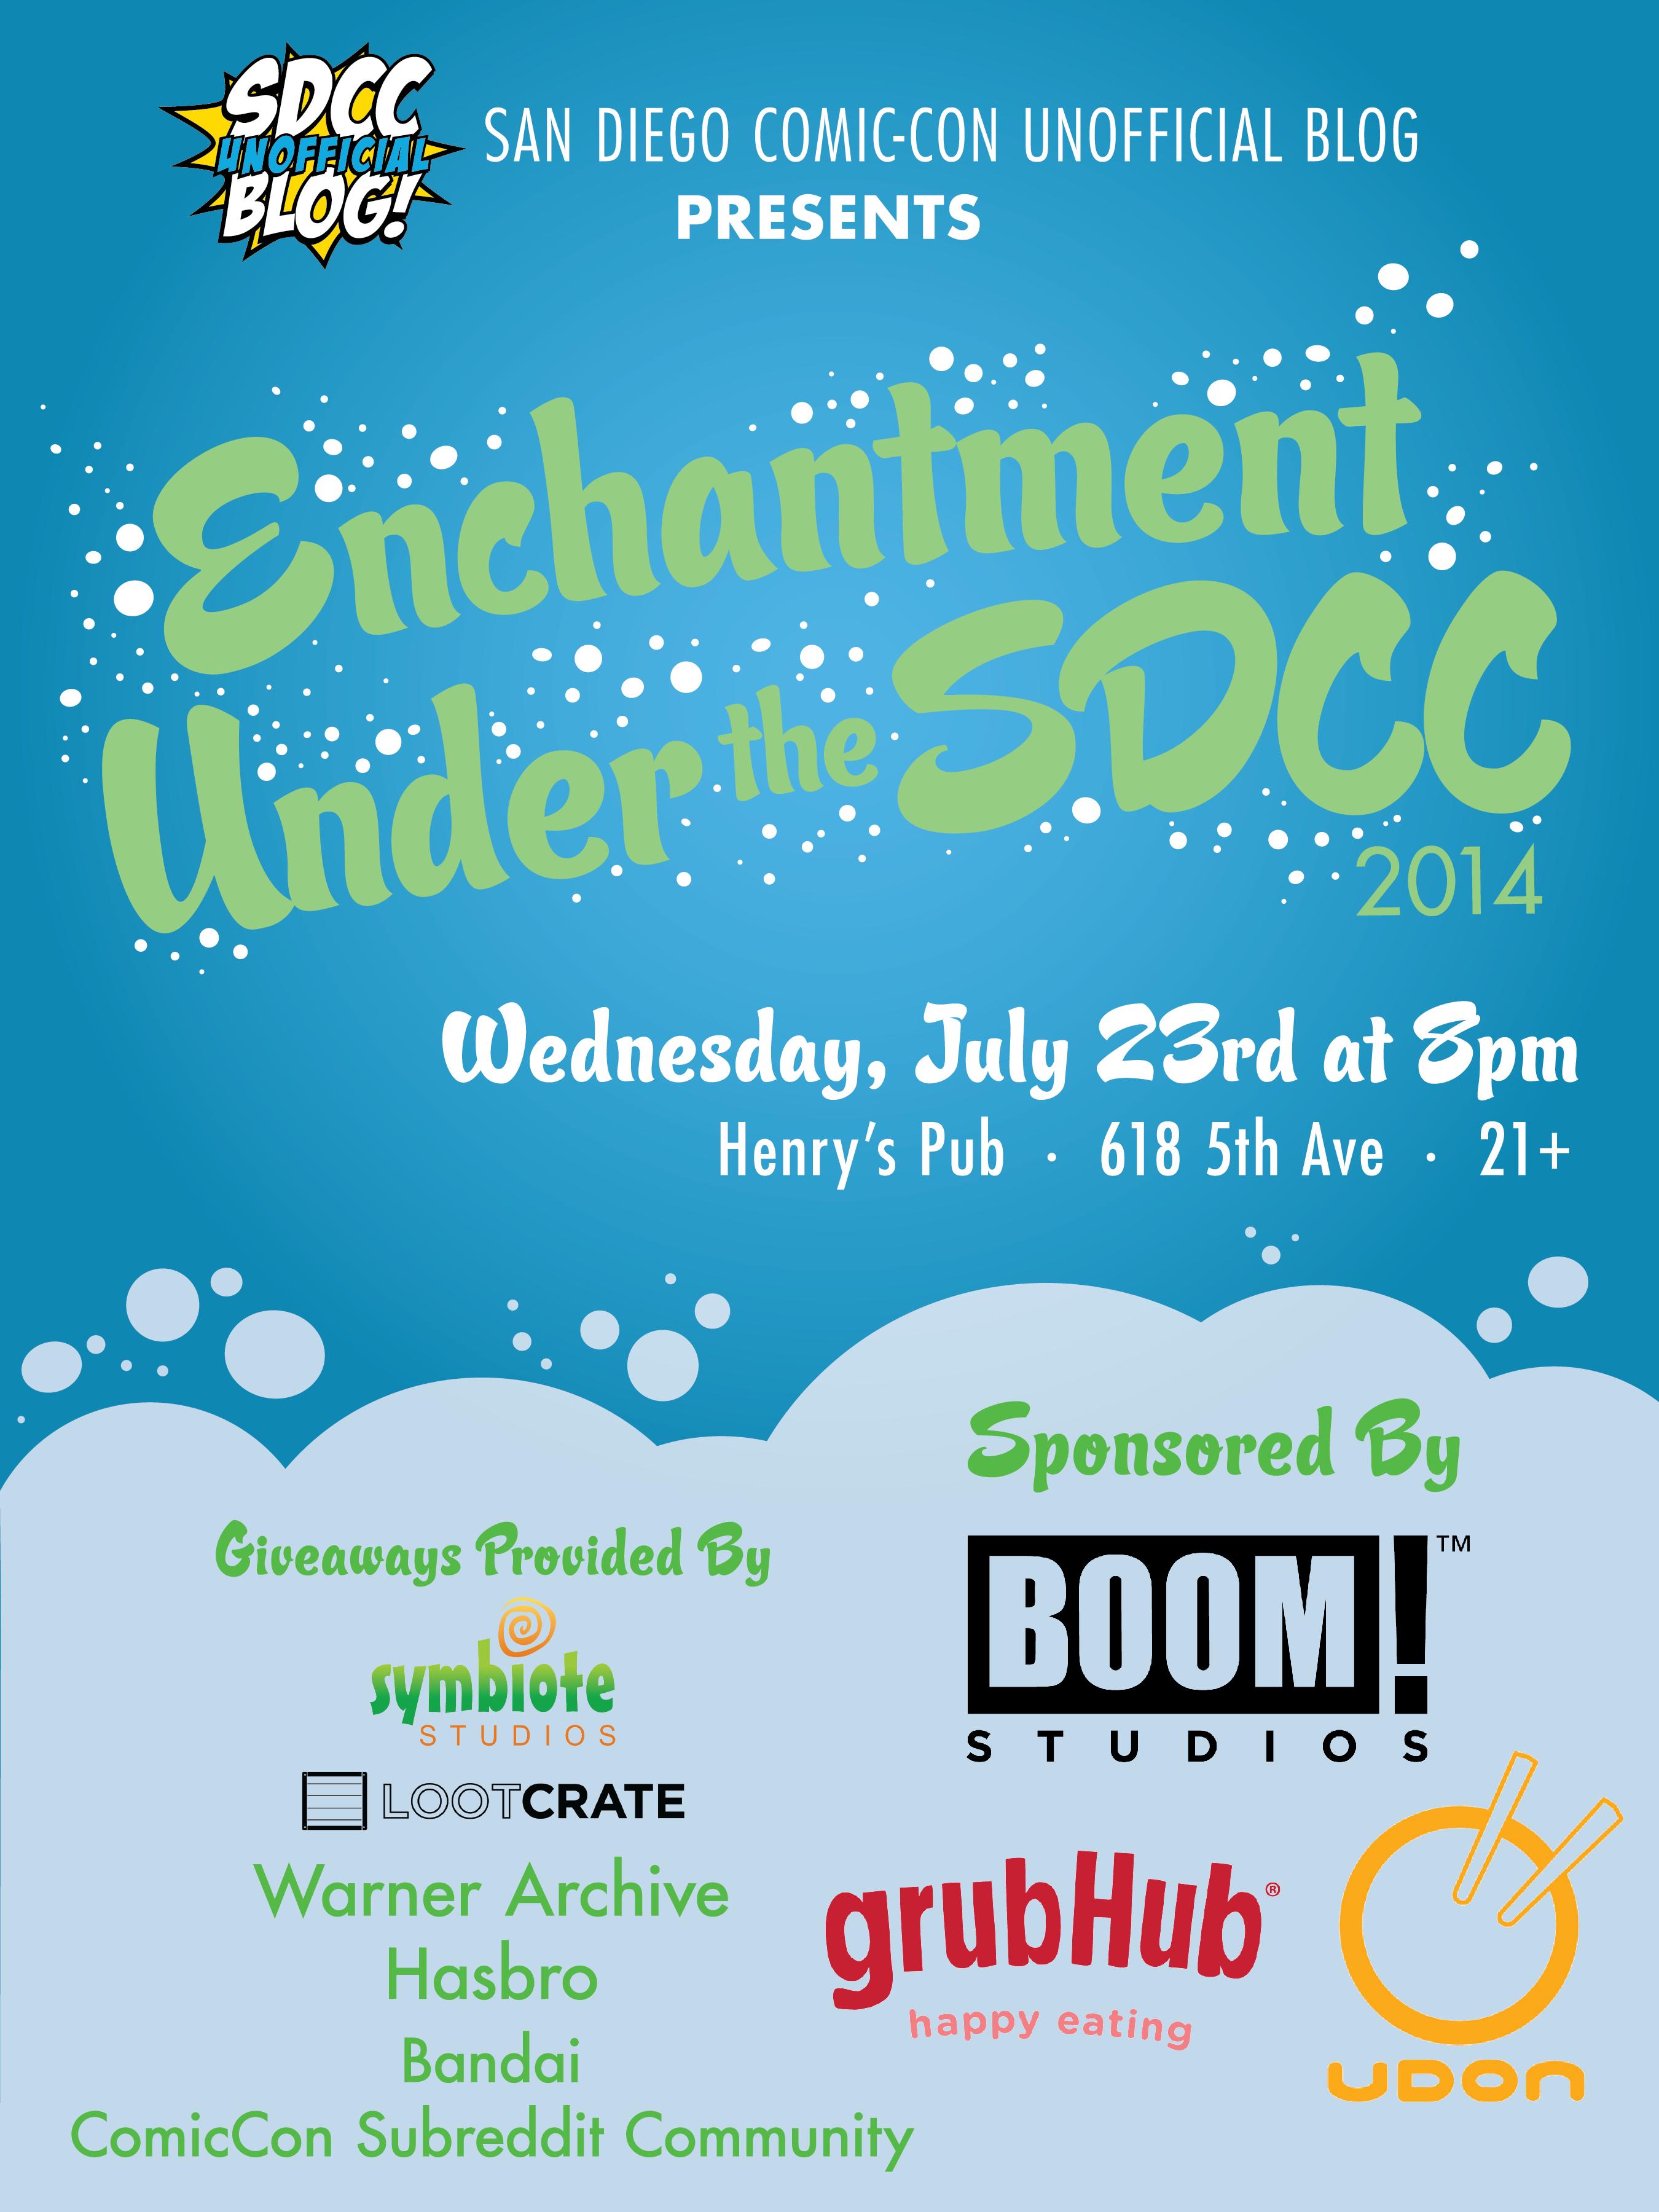 sdccblog-enchantment2014-final